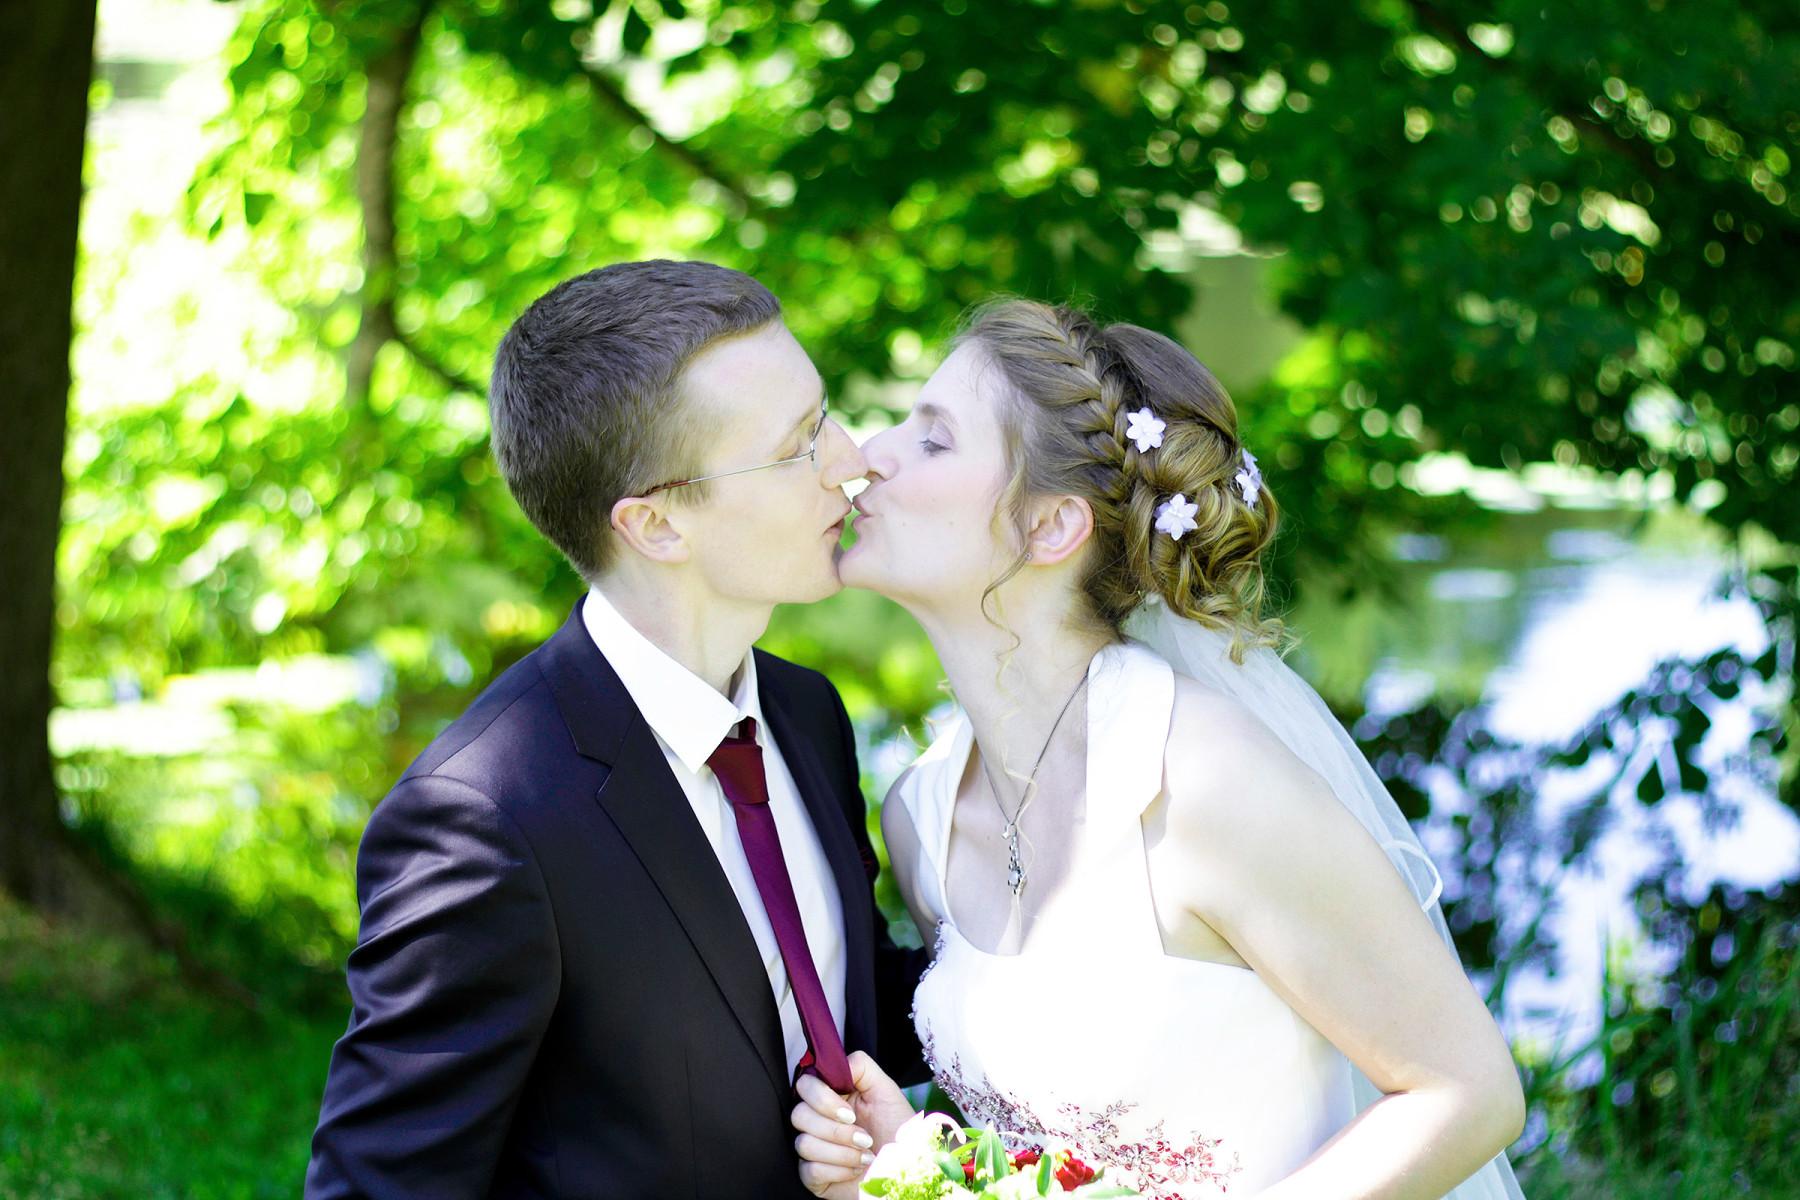 Hochzeitsfotograf Diedersdorf Mike Bielski